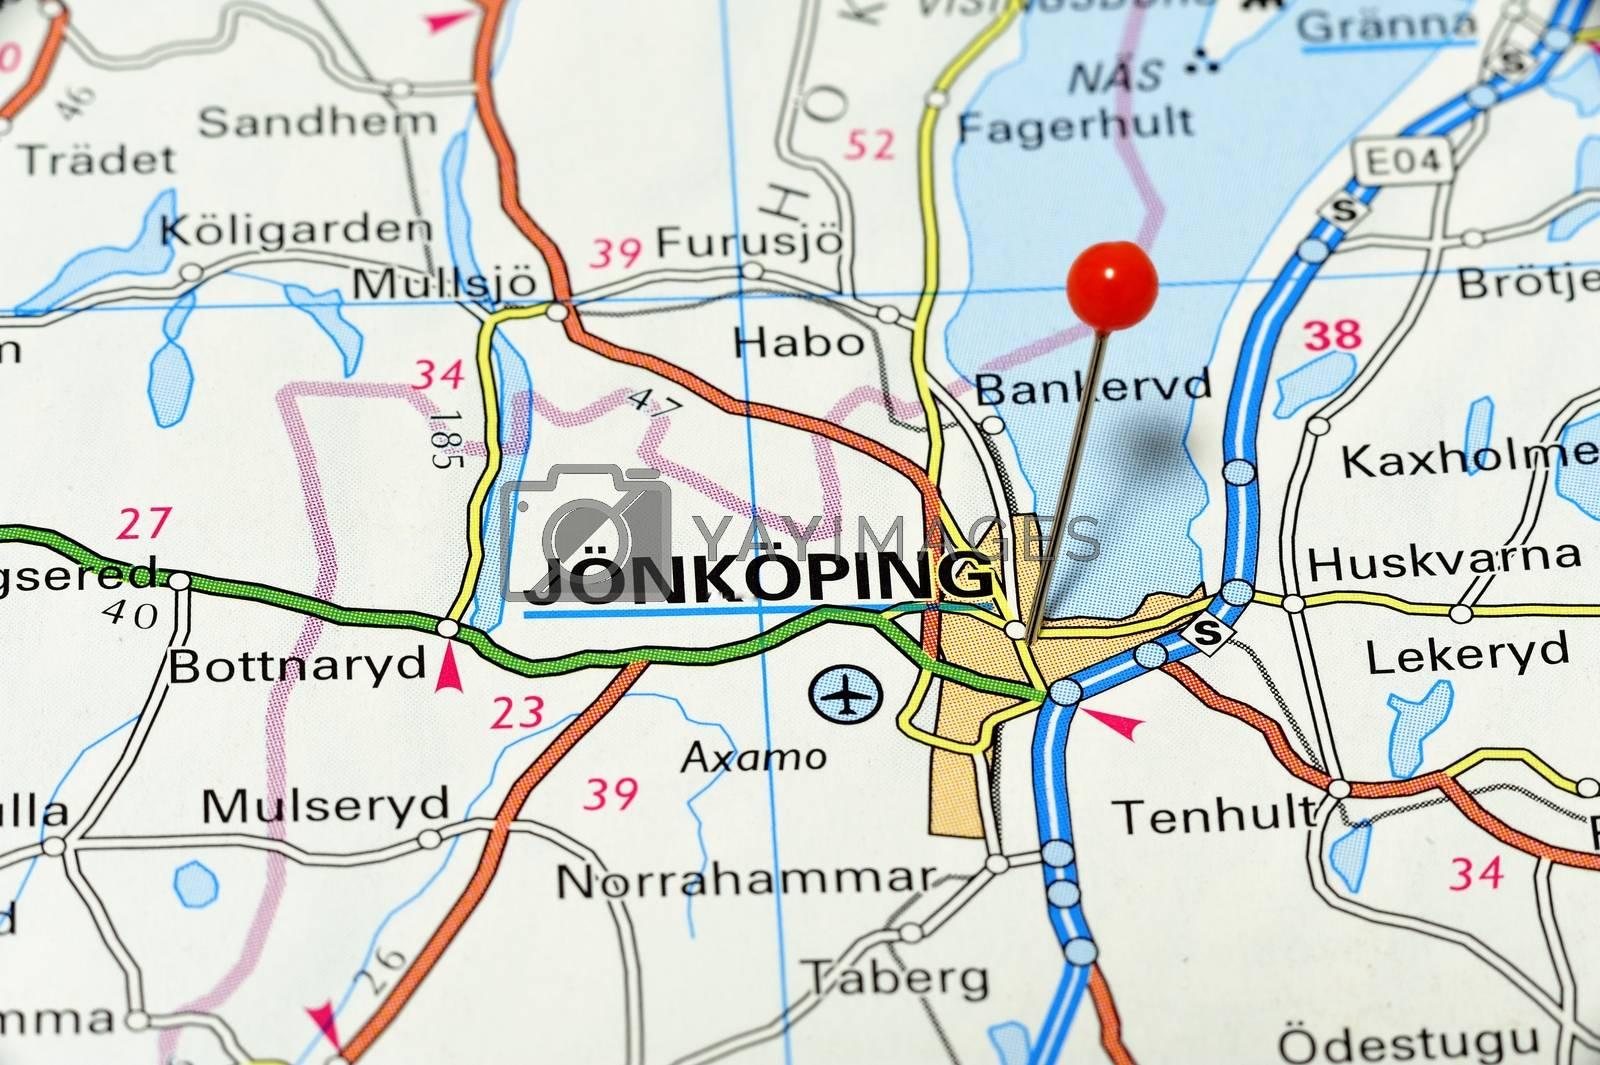 Closeup map of Jönköping. Jönköping a city in Sweden.